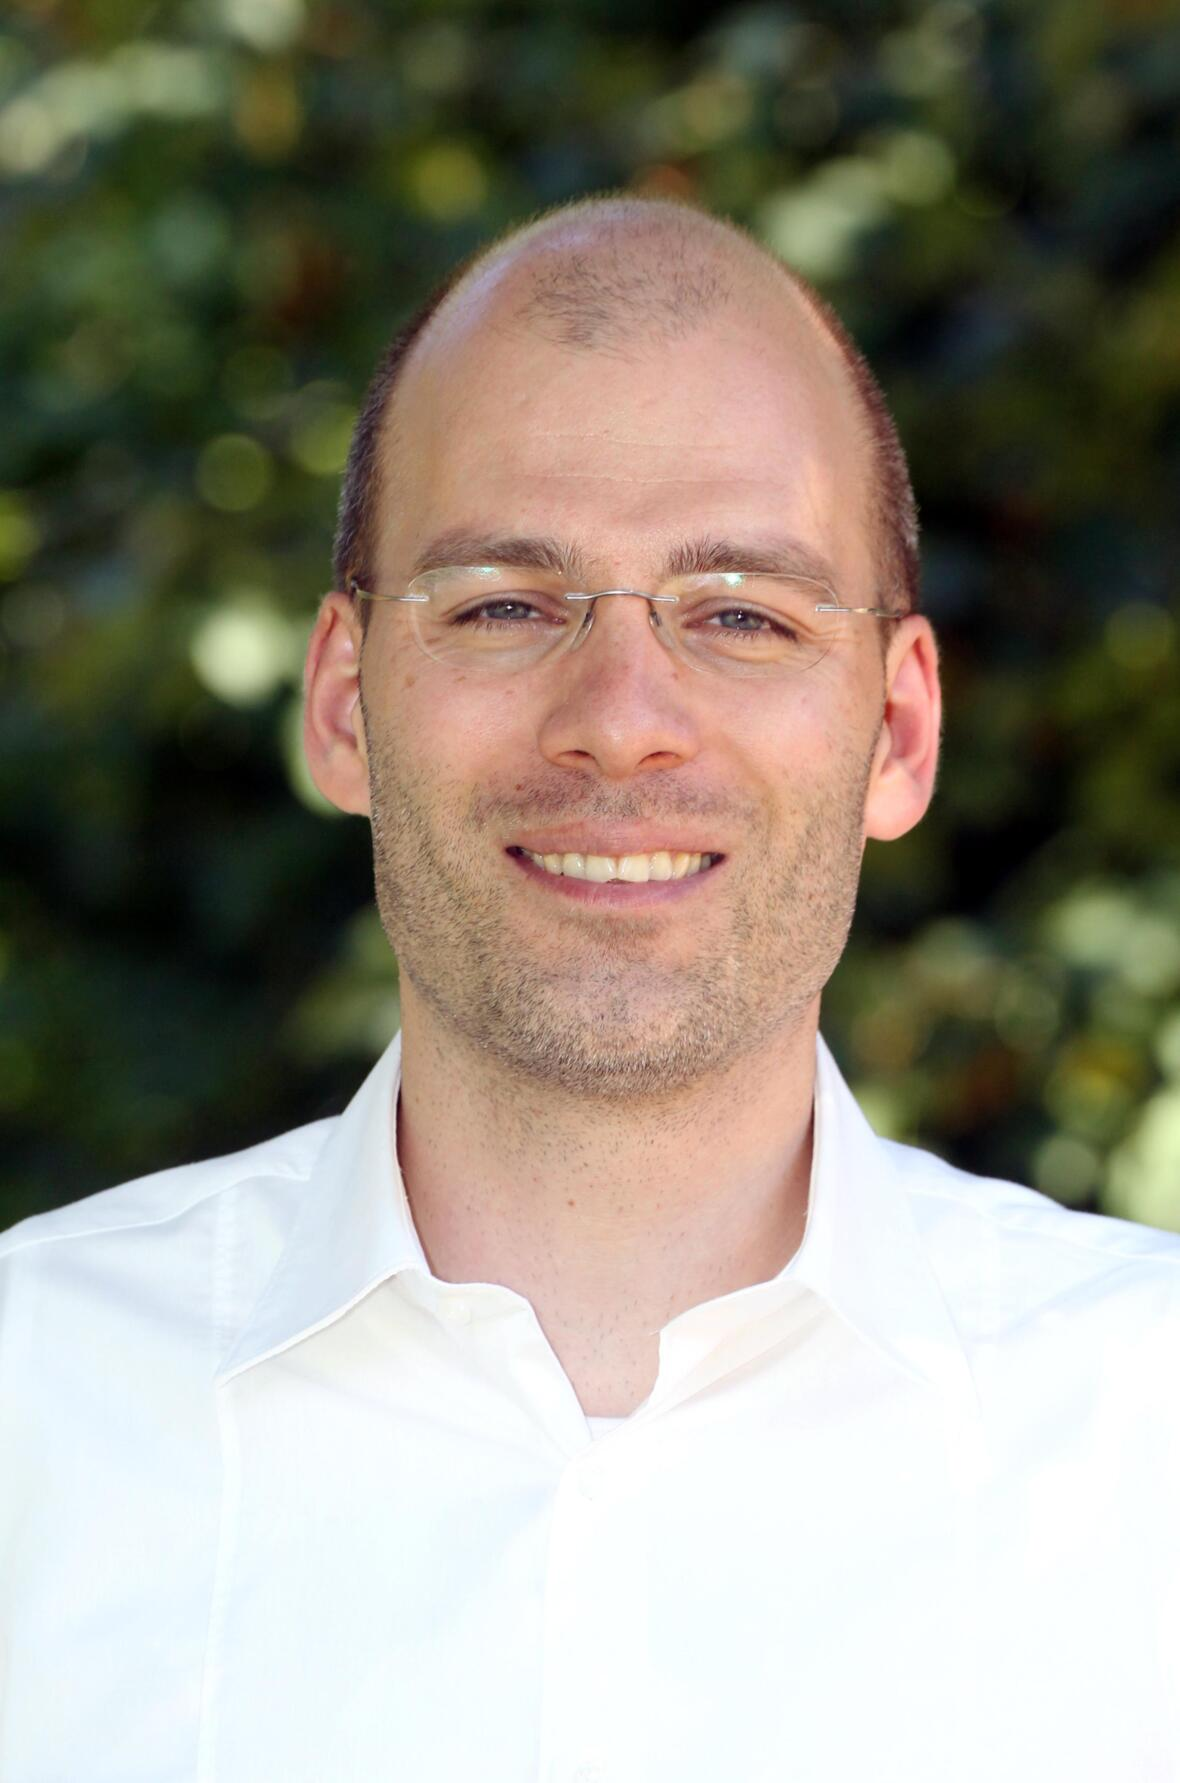 Michael Leupolz